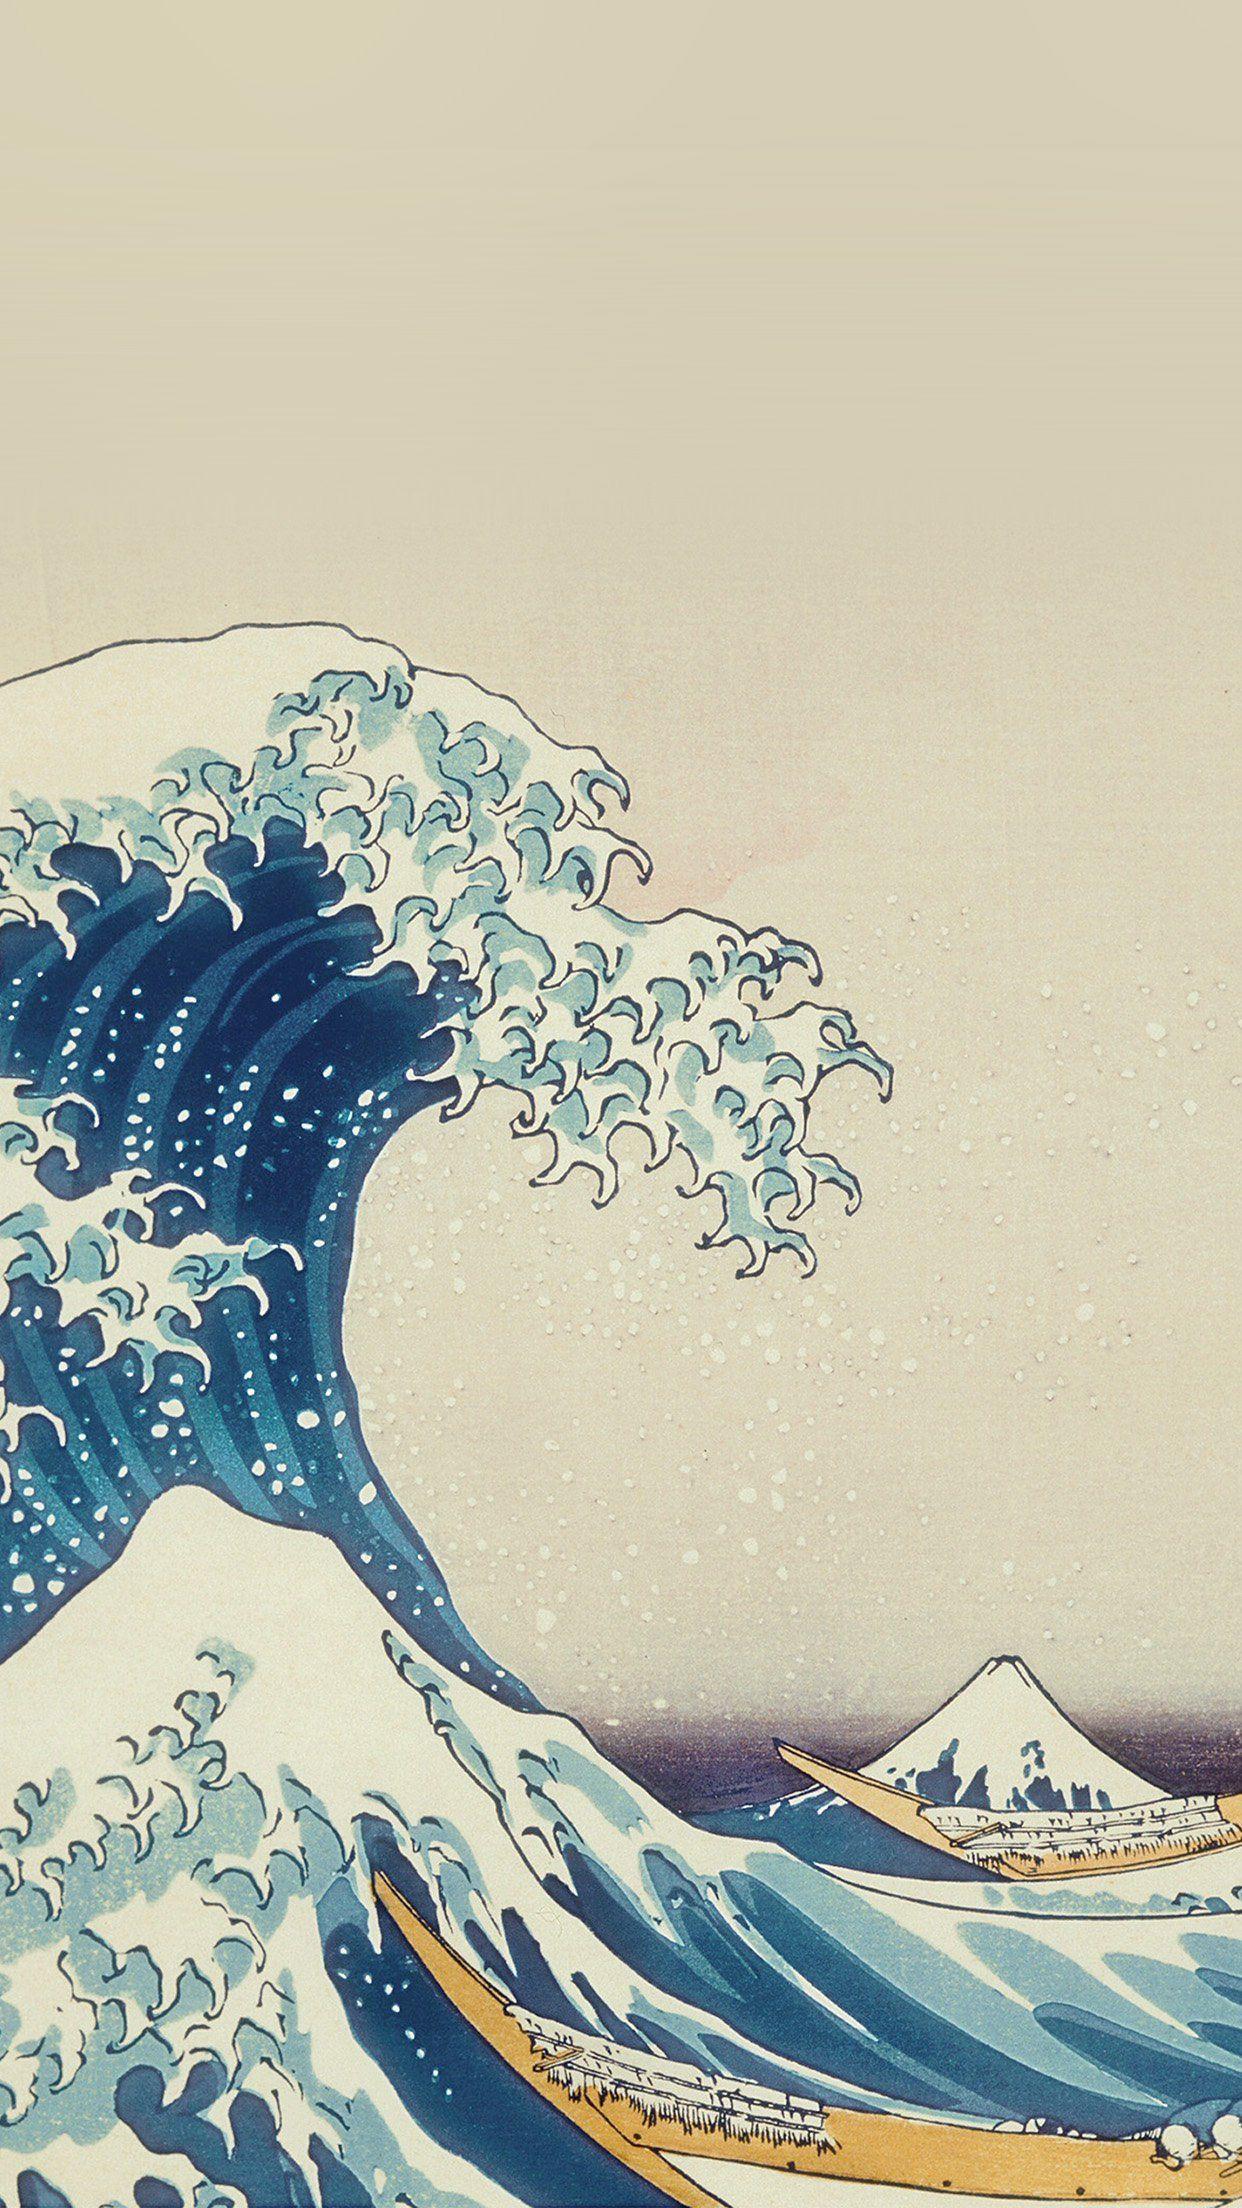 cool wave art hokusai painting classic art illustration iphone6 1242x2208